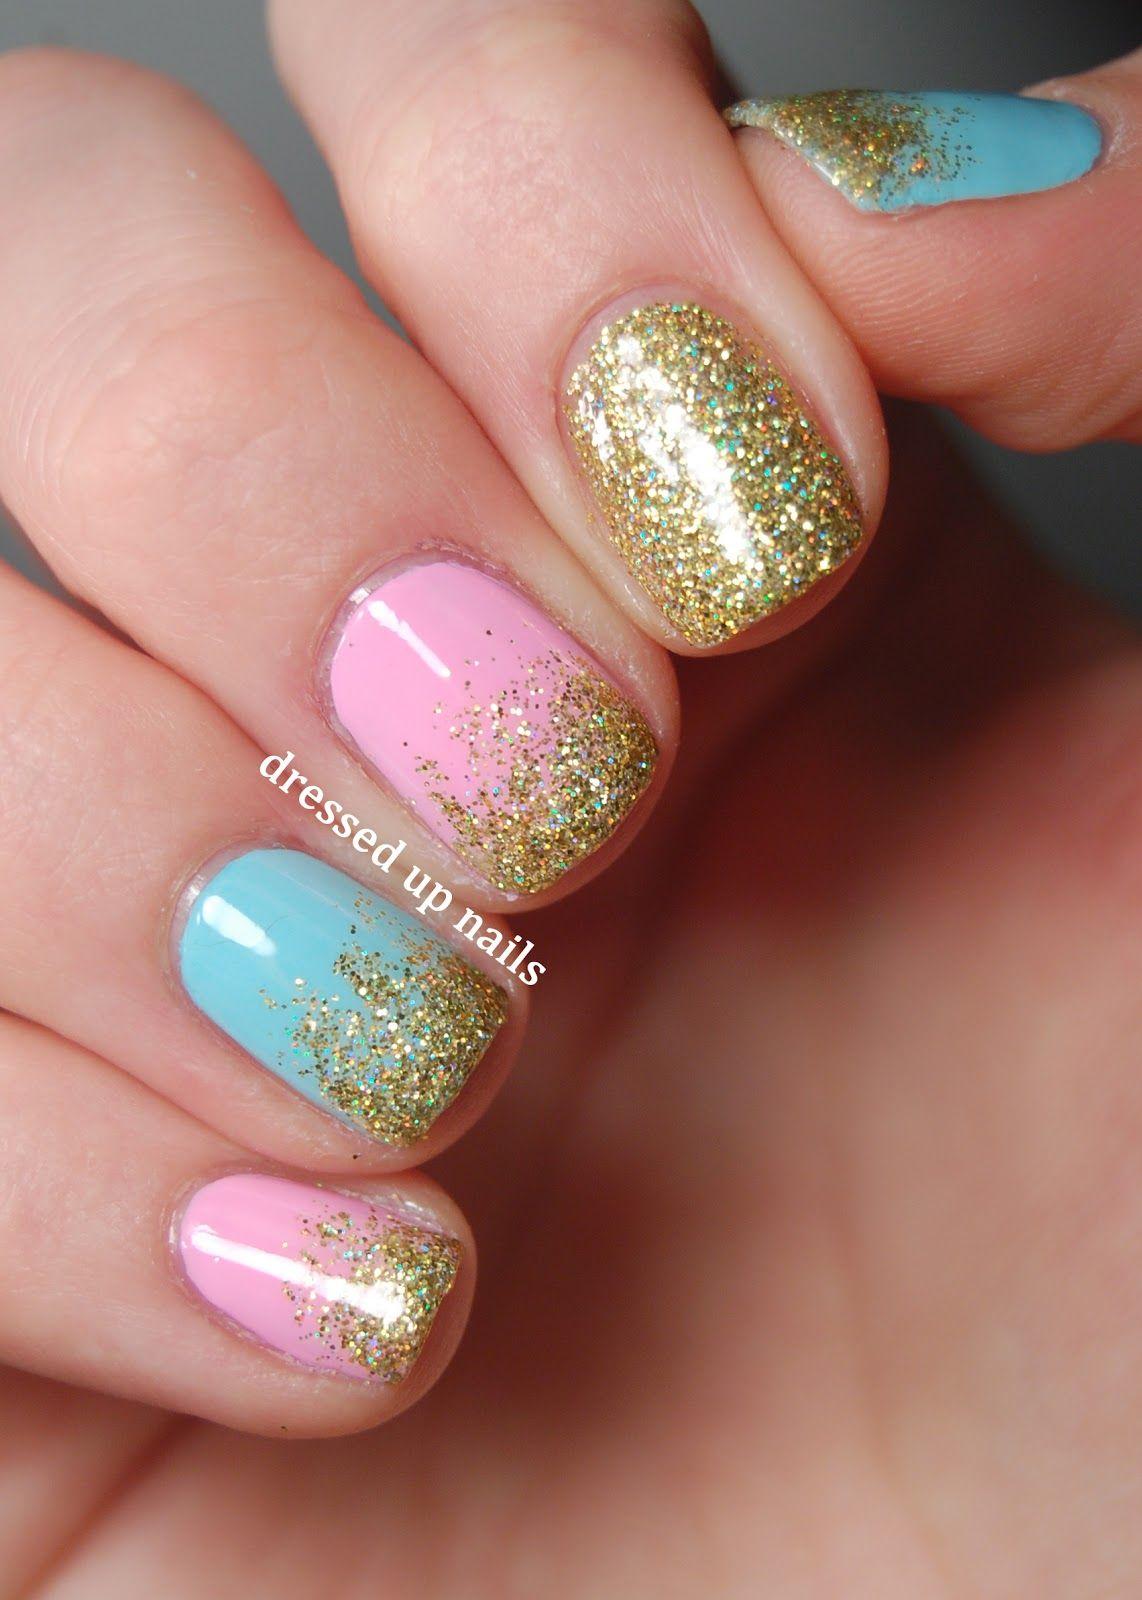 Glitter nail art images easy glitter gradient nail art with floss glitter nail art images easy glitter gradient nail art with floss gloss stun perf solutioingenieria Choice Image